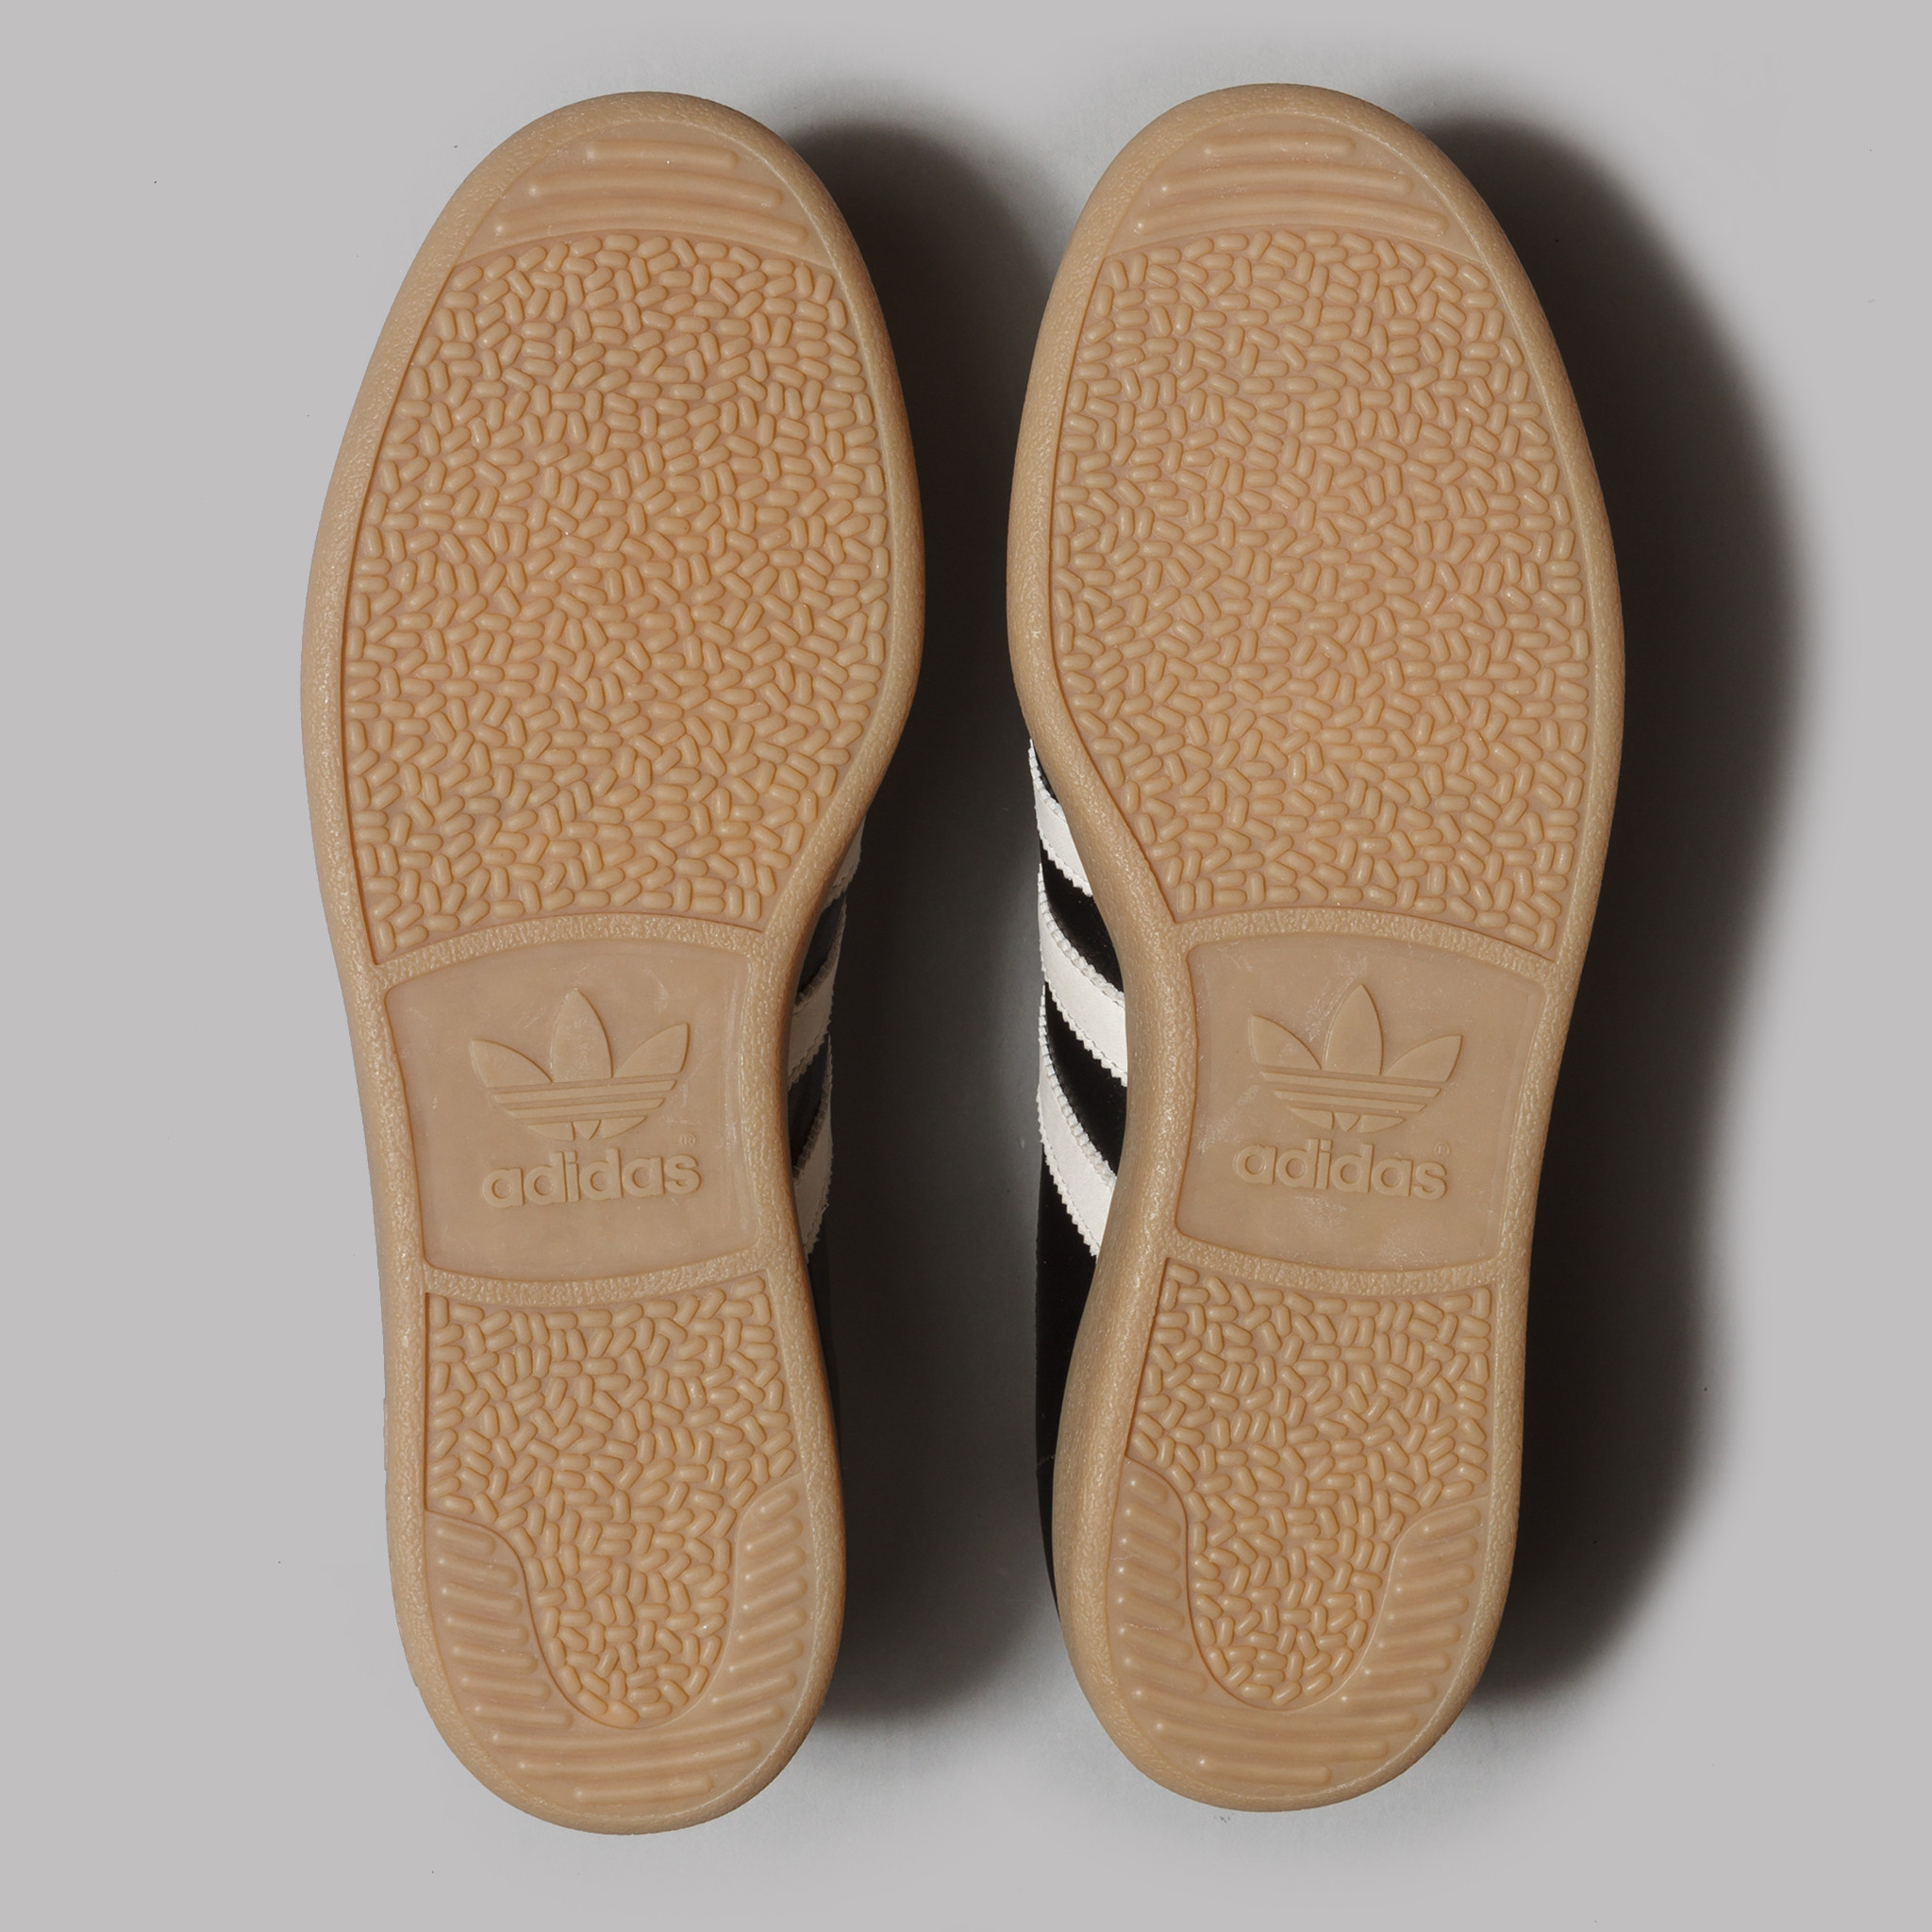 adidas-ashington-191016-01-04